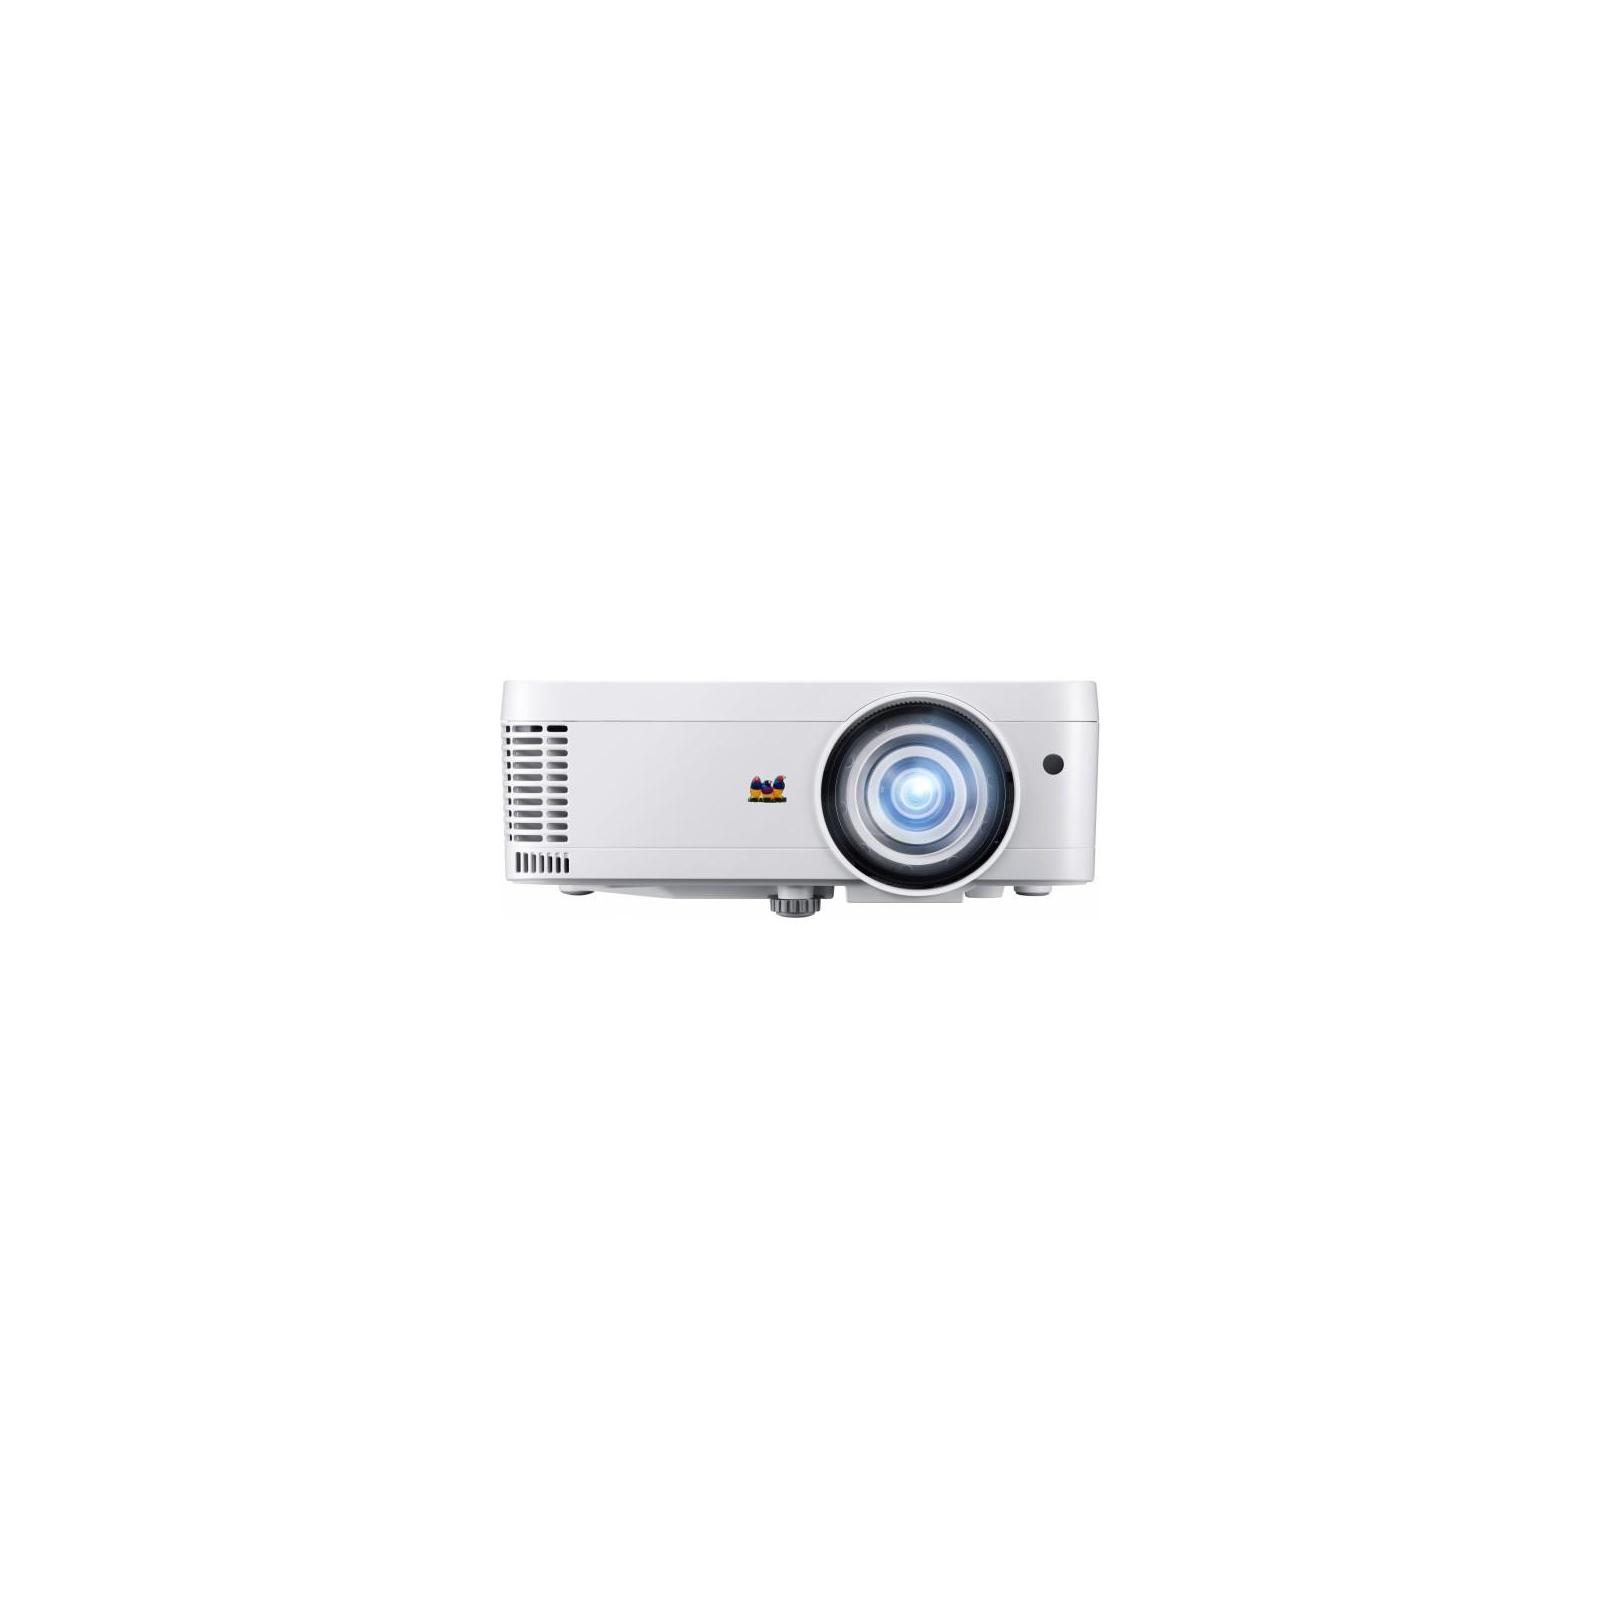 Проектор Viewsonic PS501W (VS17261) изображение 2